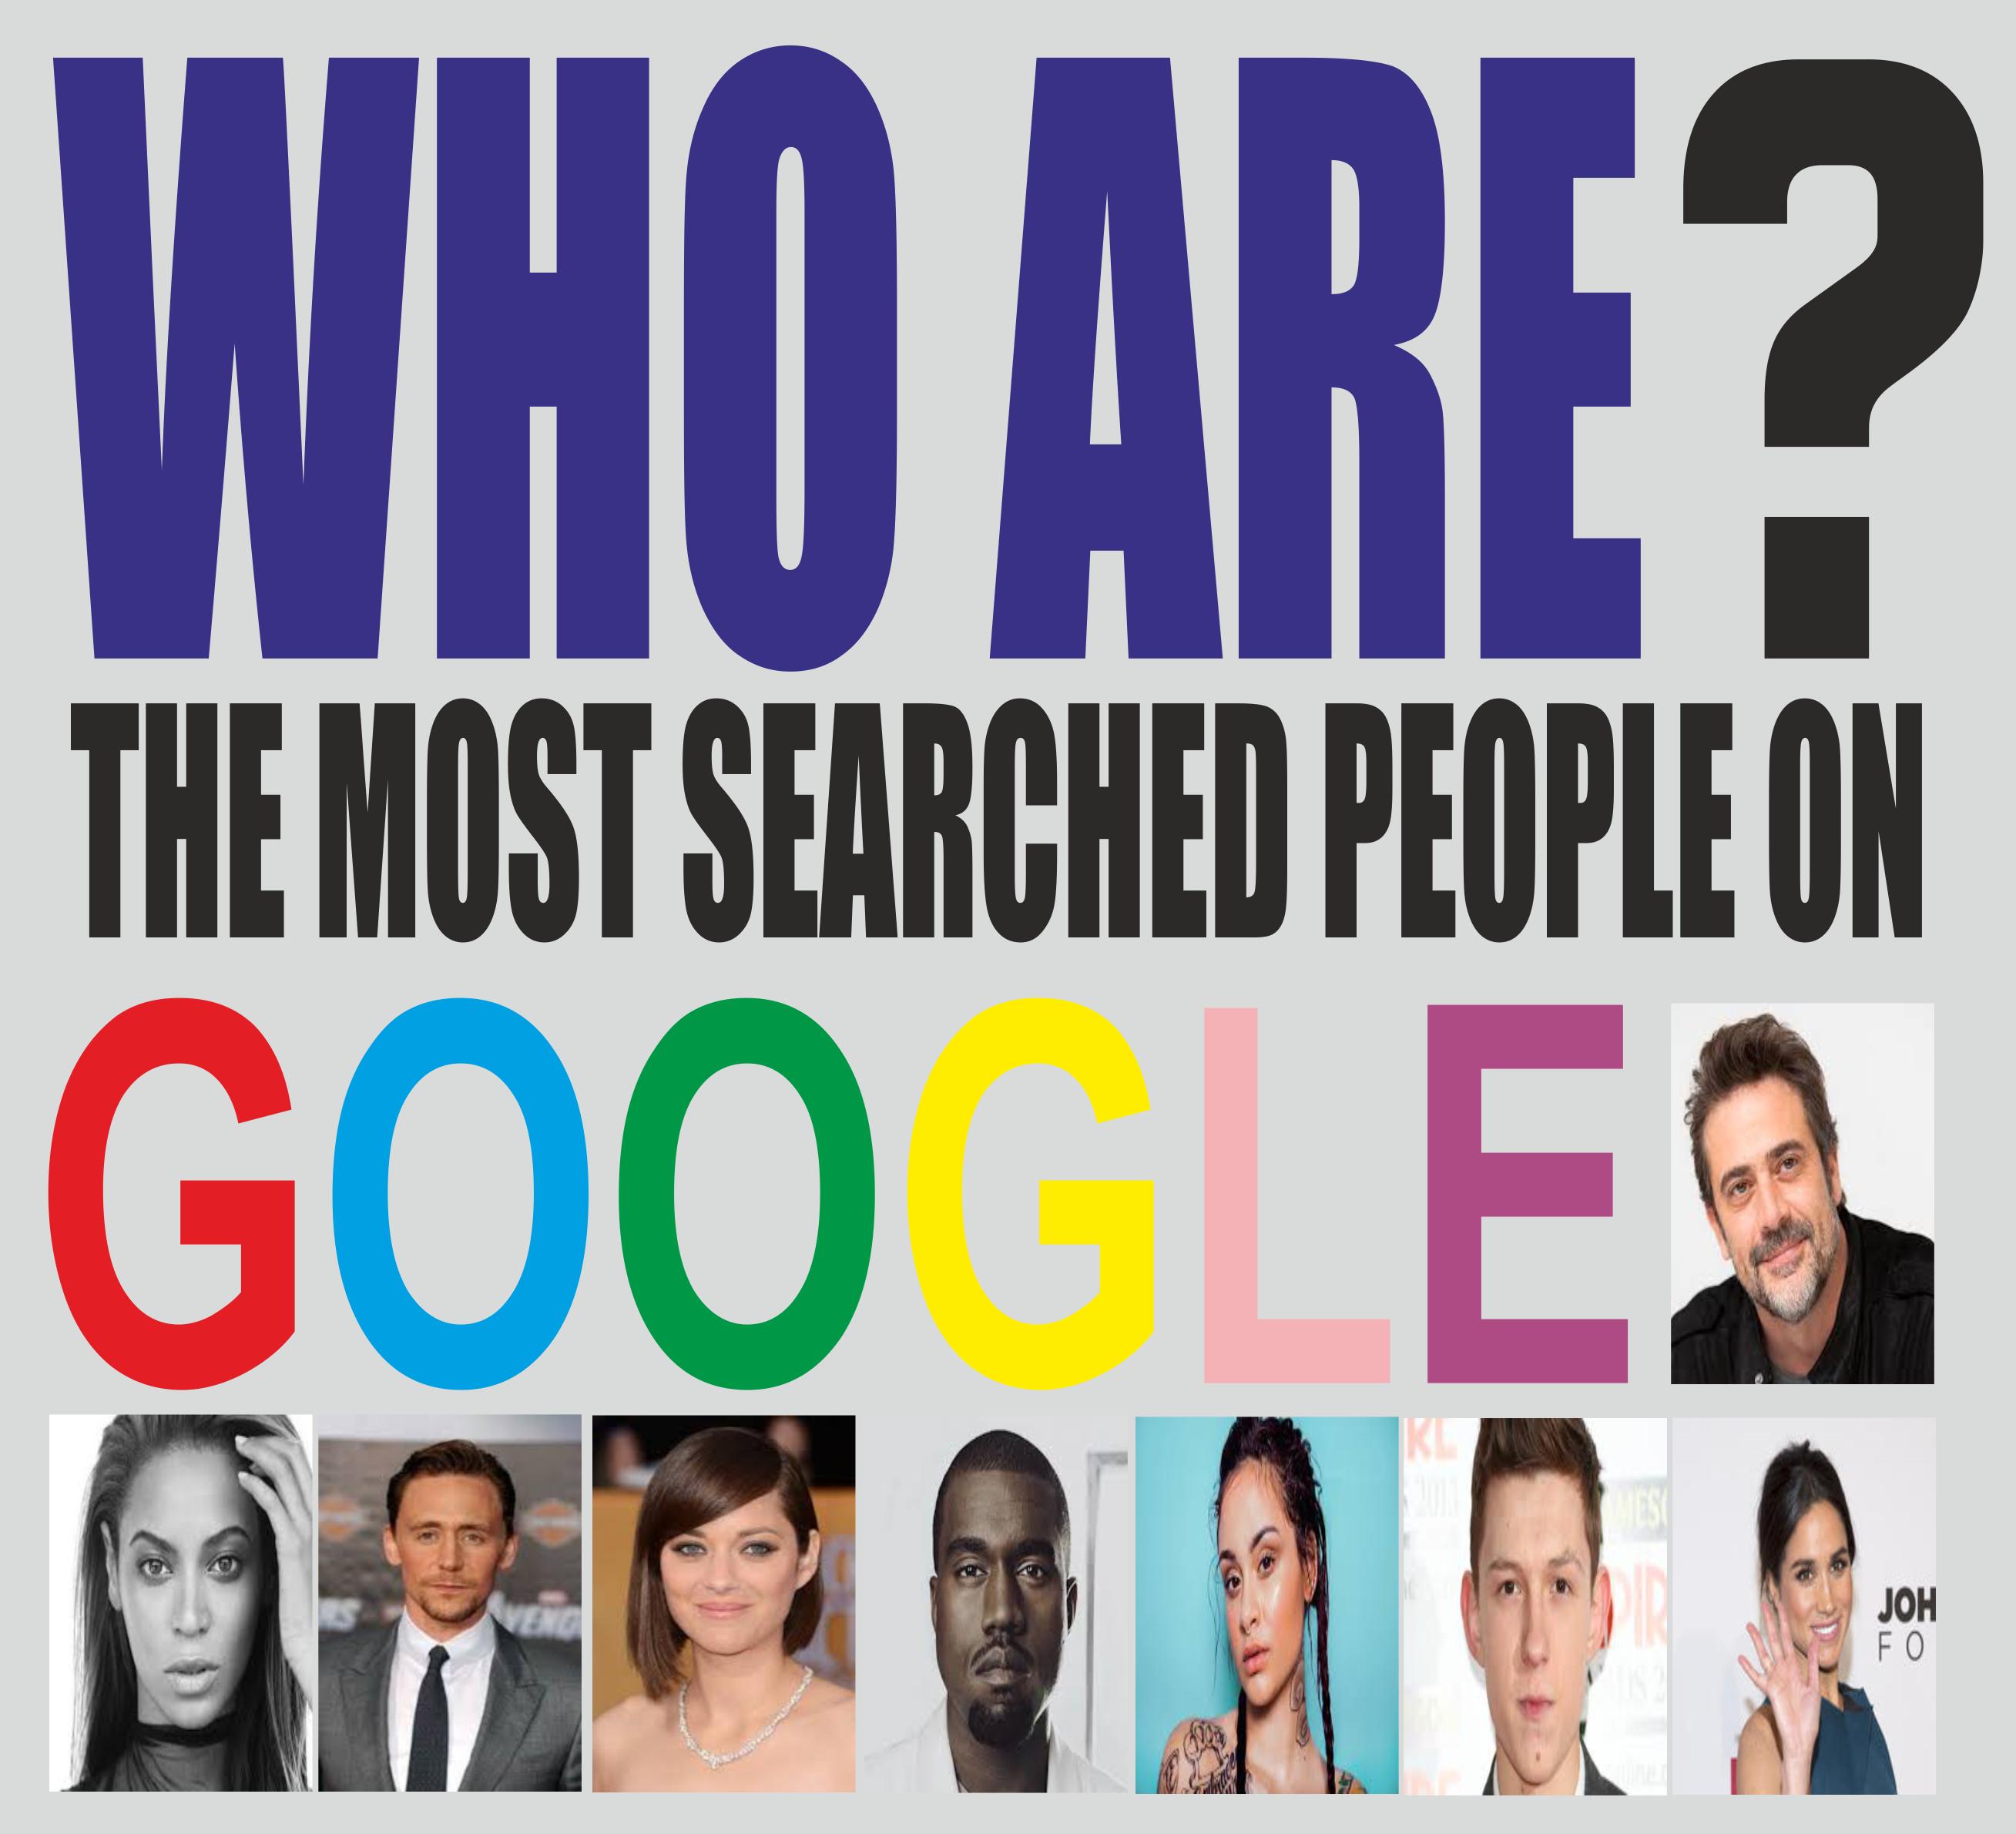 GGOGLE MOST SEARCHED CELEBRITIES 2016 http//freepubquiz